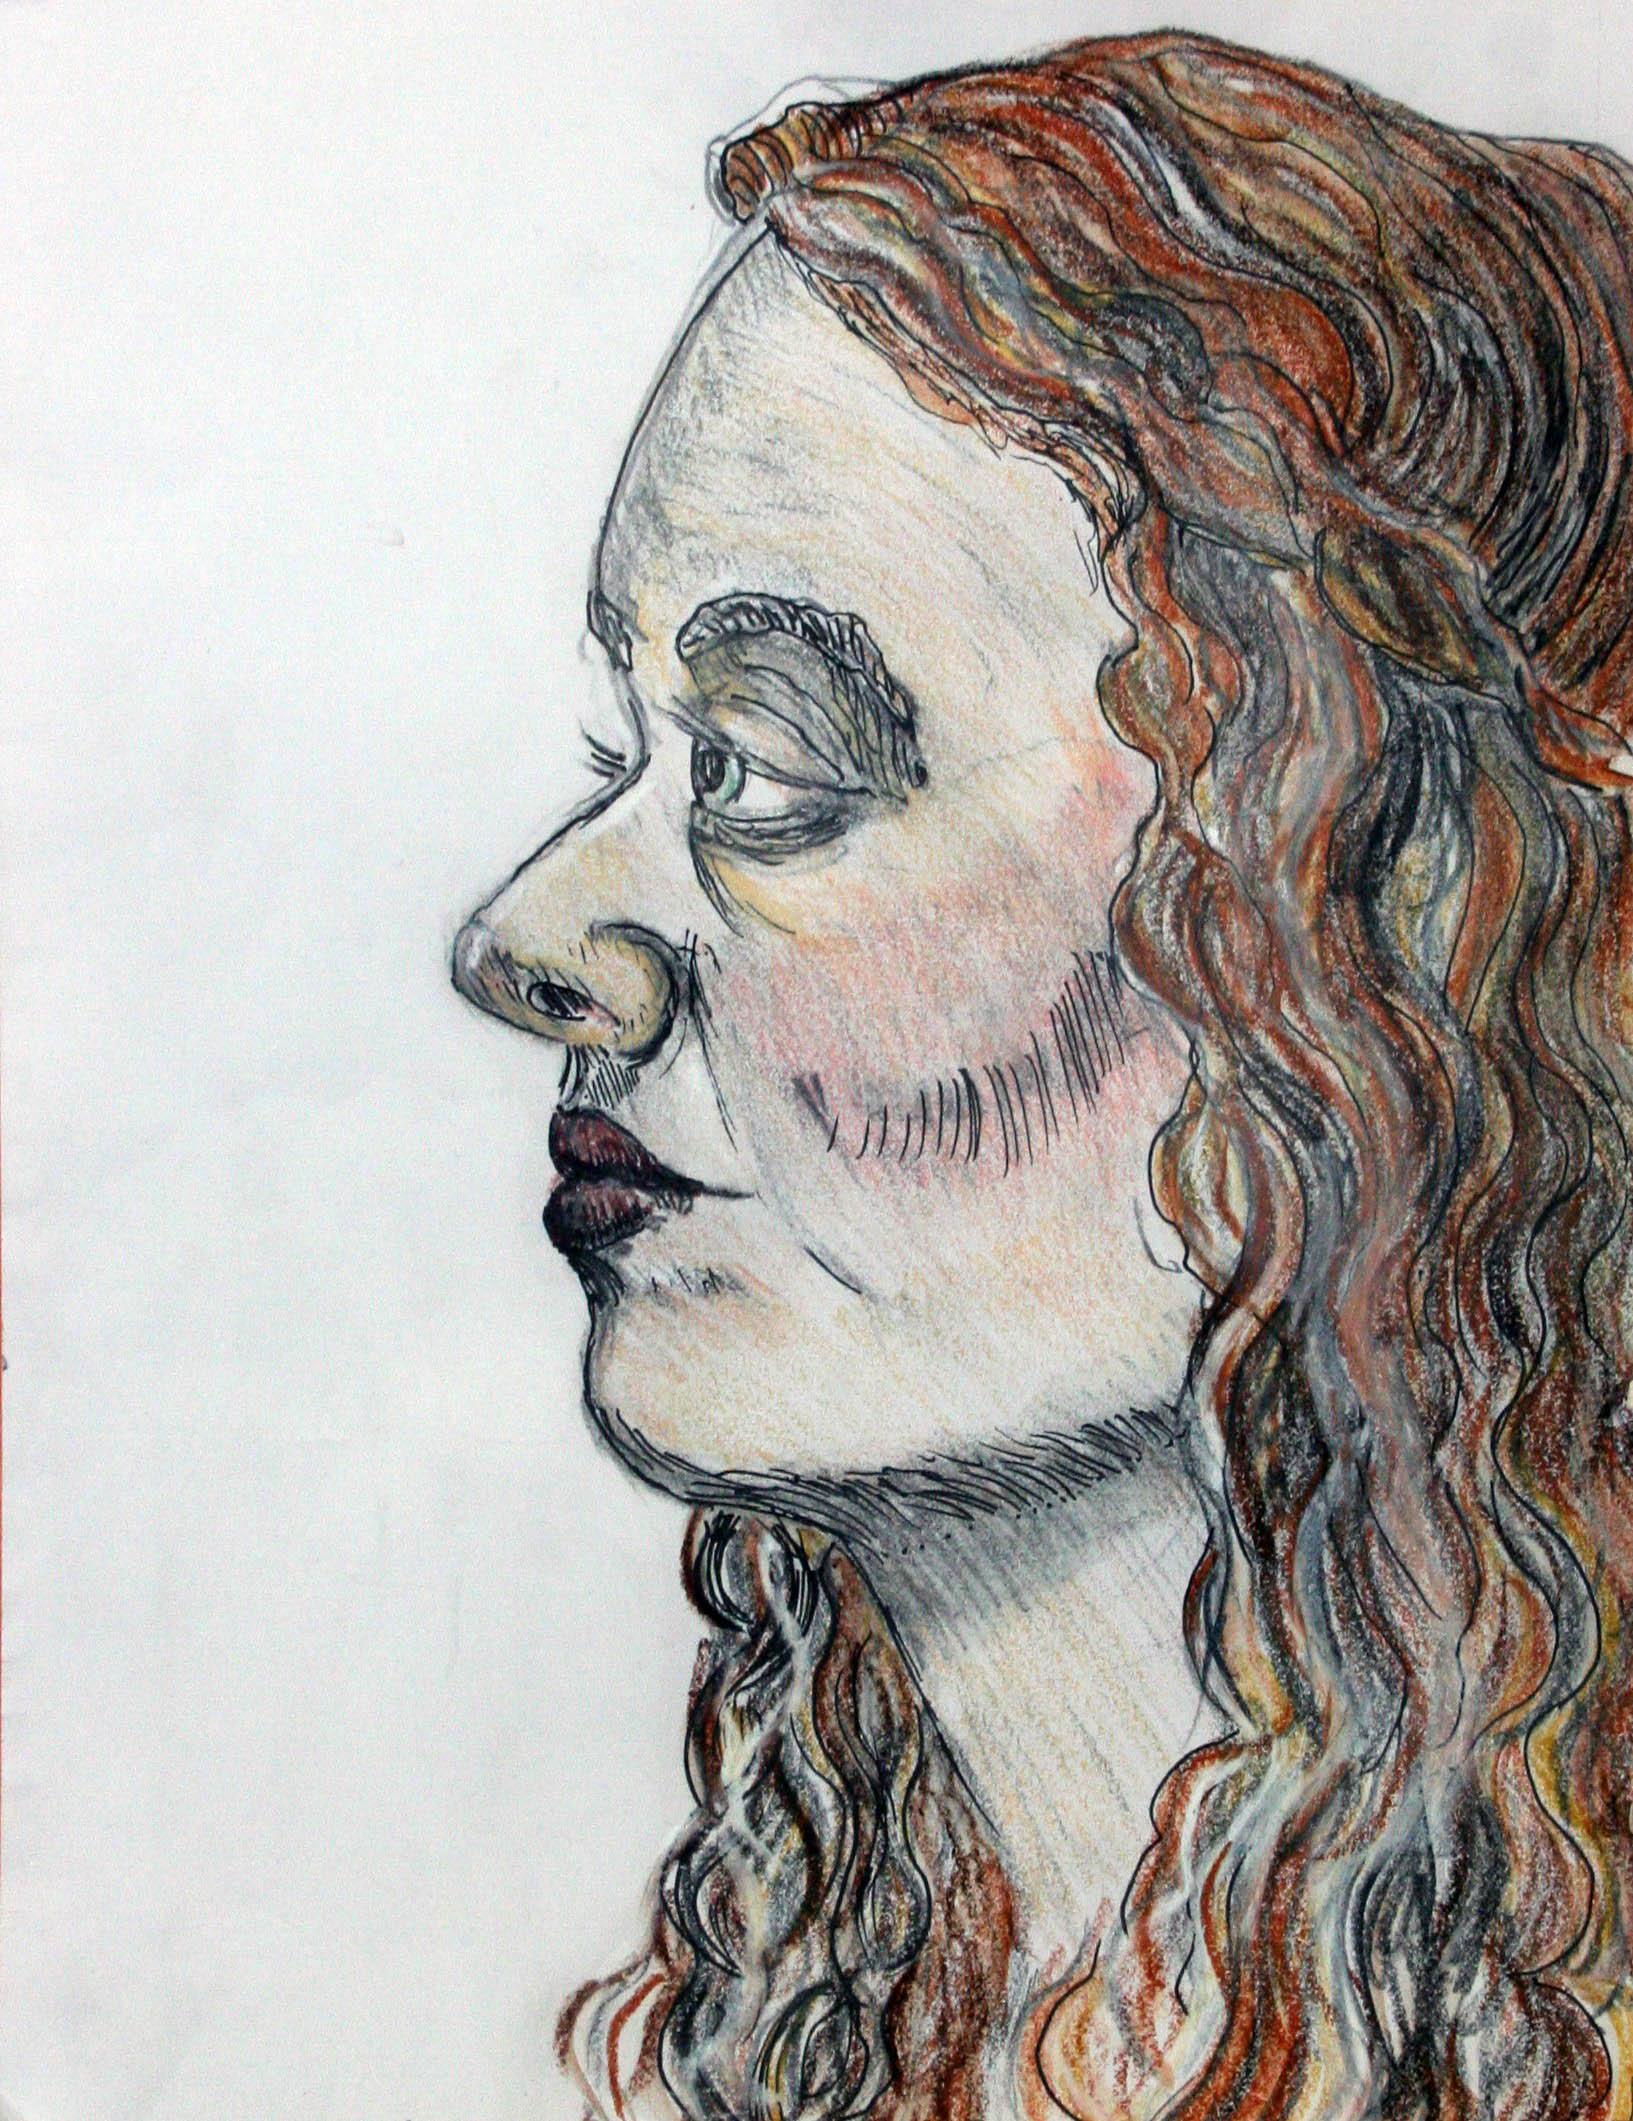 Liz Gulaian did this drawing.